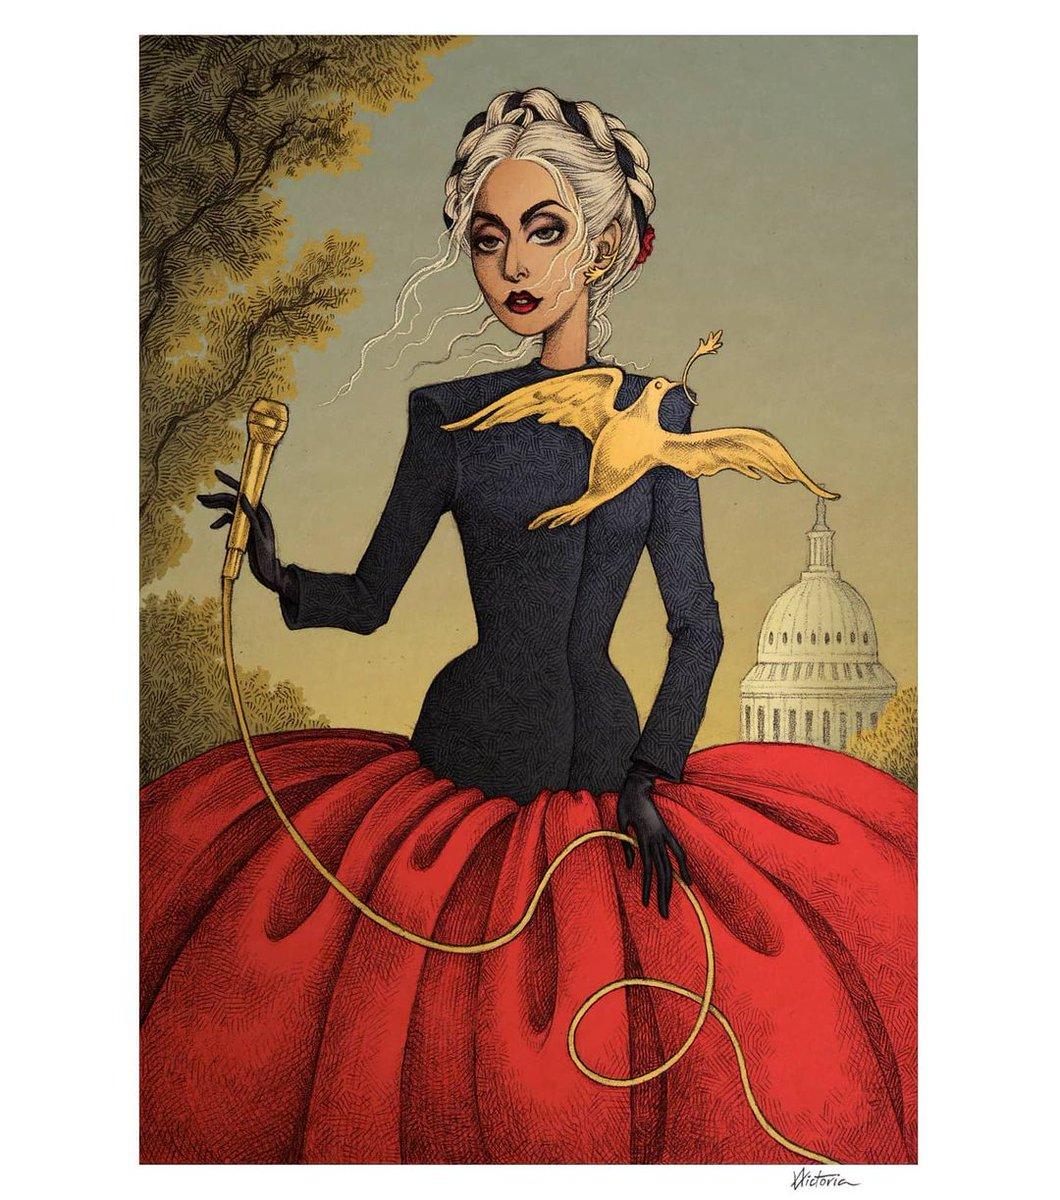 🇺🇸 #𝗕𝗶𝗱𝗲𝗻𝗜𝗻𝗮𝘂𝗴𝘂𝗿𝗮𝘁𝗶𝗼𝗻 🇺🇸  #Inauguration2021 #MonsterArt by Albert Victoria!!   #GoT #GameOfThrones #JoeBiden #KamalaHarris #USA #InaugurationDay #nationalanthem #LadyGaga #LittleMonsters #drawing #art #Gaga #PEACE #LOVE #Kindness @ladygaga